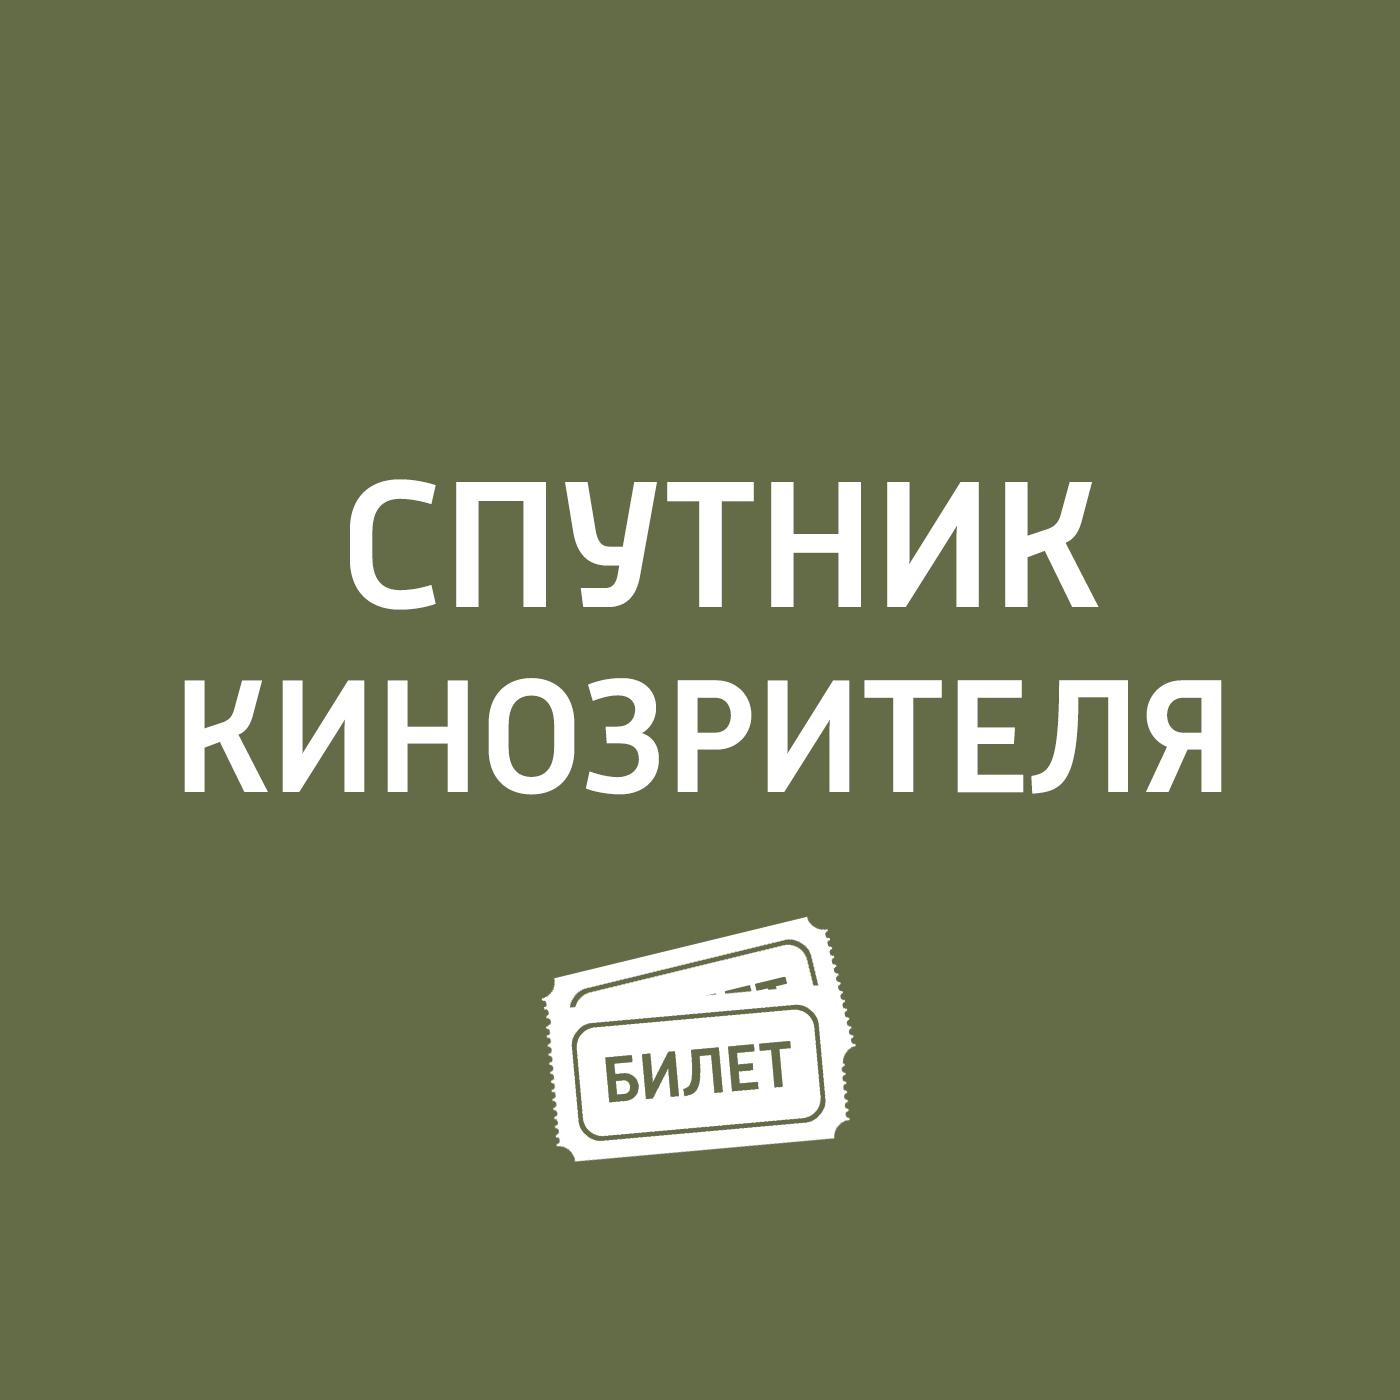 Антон Долин Берлинале 2016. Огонь в море антон долин об итогах берлинале 2017